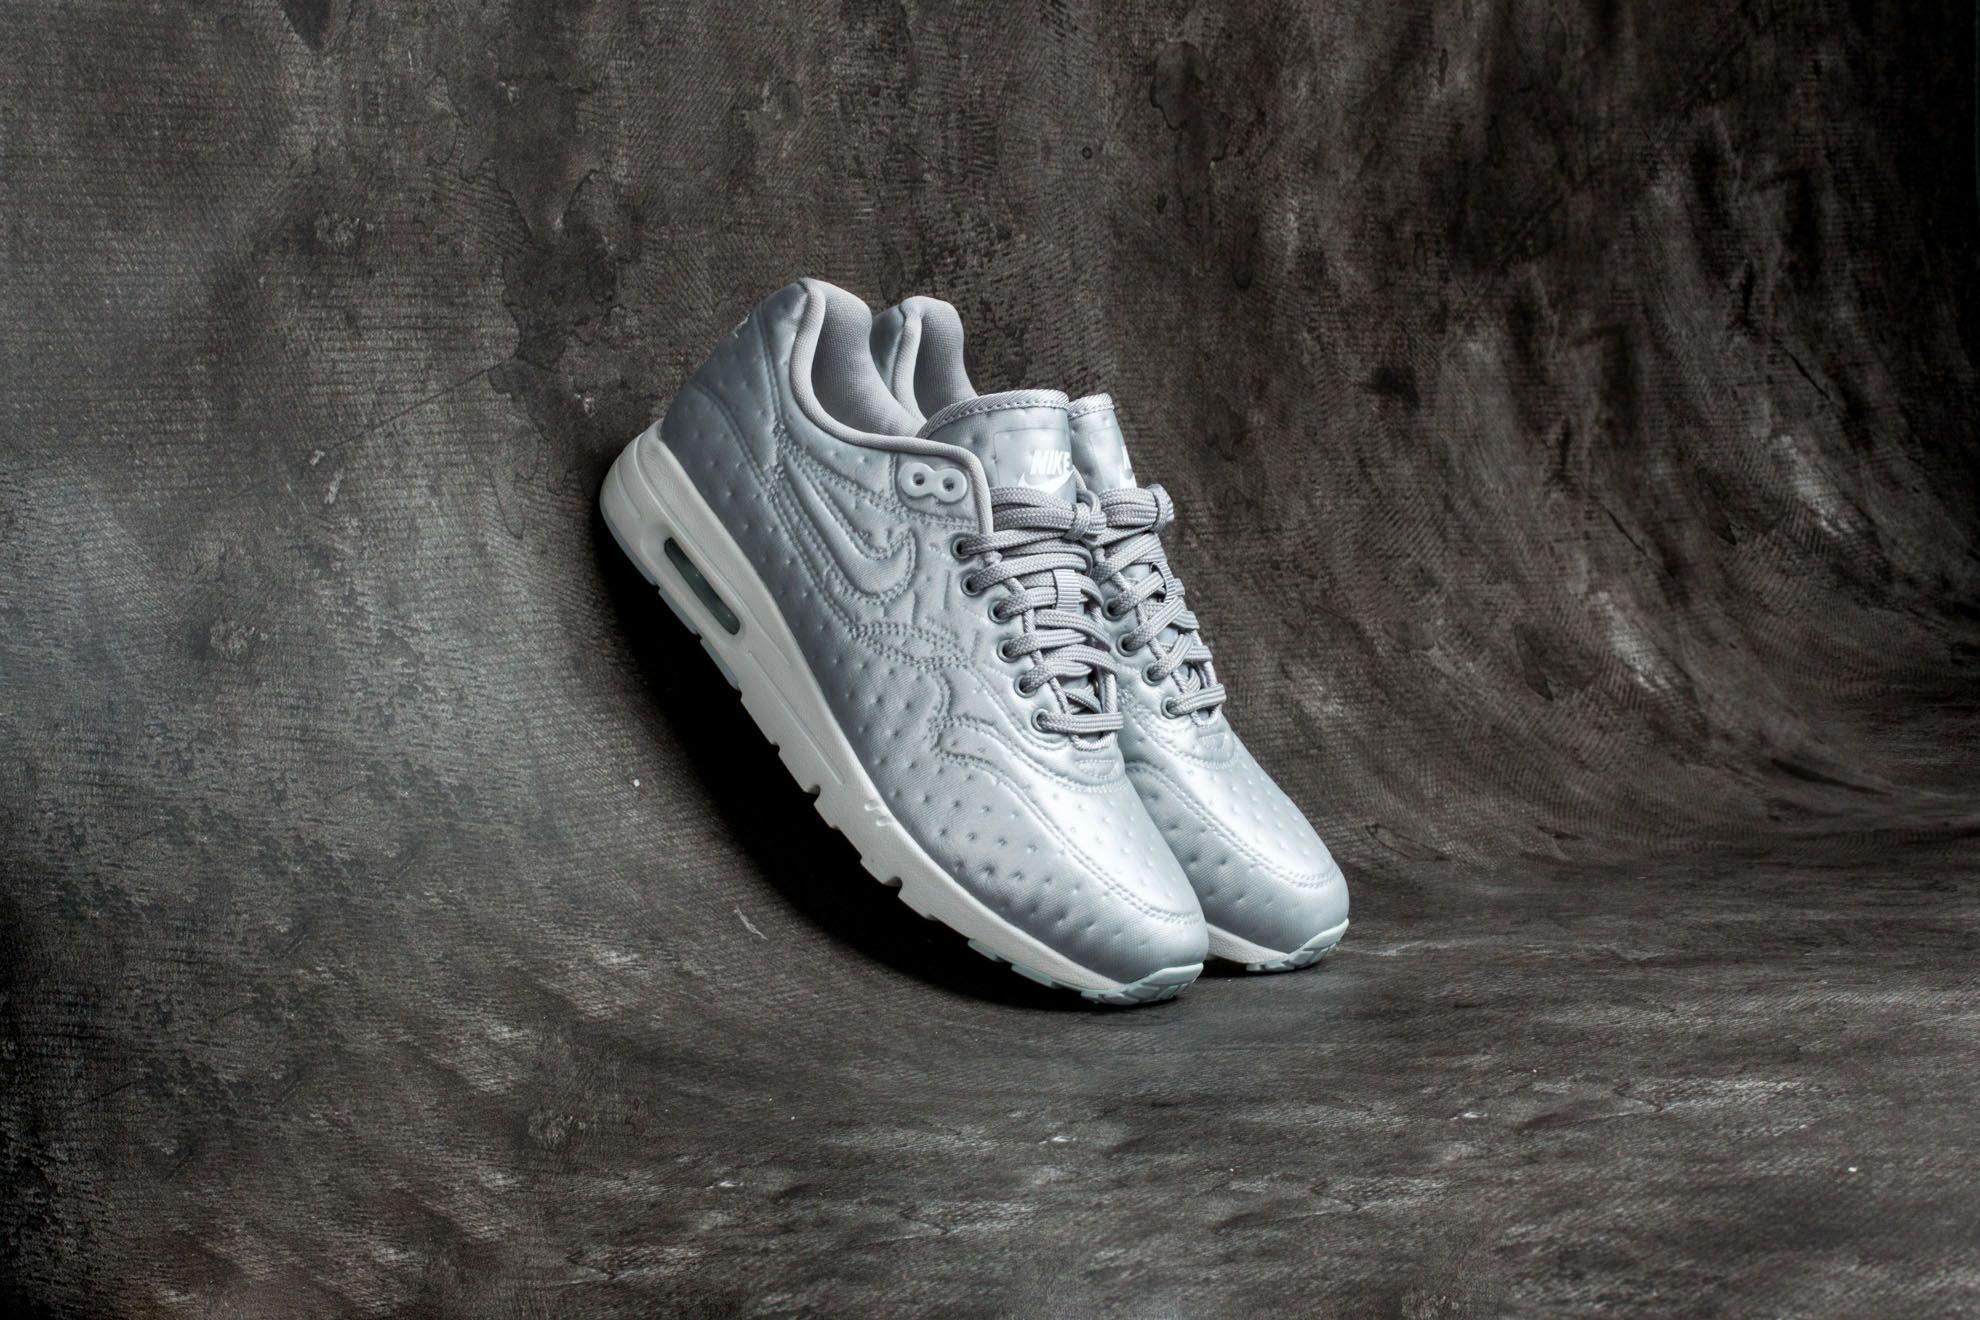 Nike W Air Max 1 Ultra Premium Jacquard Metallic Silver/ Matte Silver